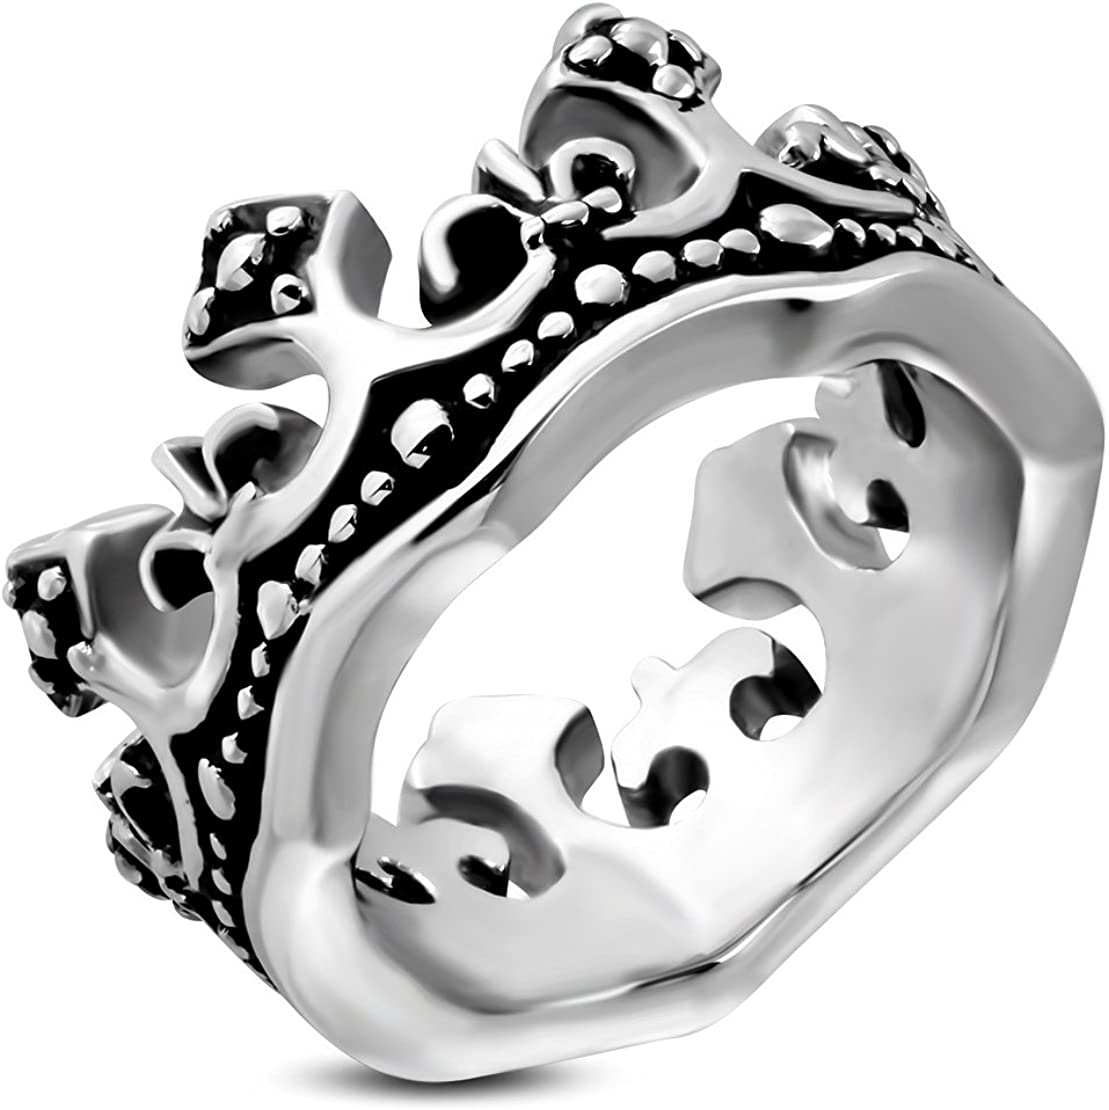 Stainless Steel Fleur De Lis Flower Royal Princess Crown Biker Ring